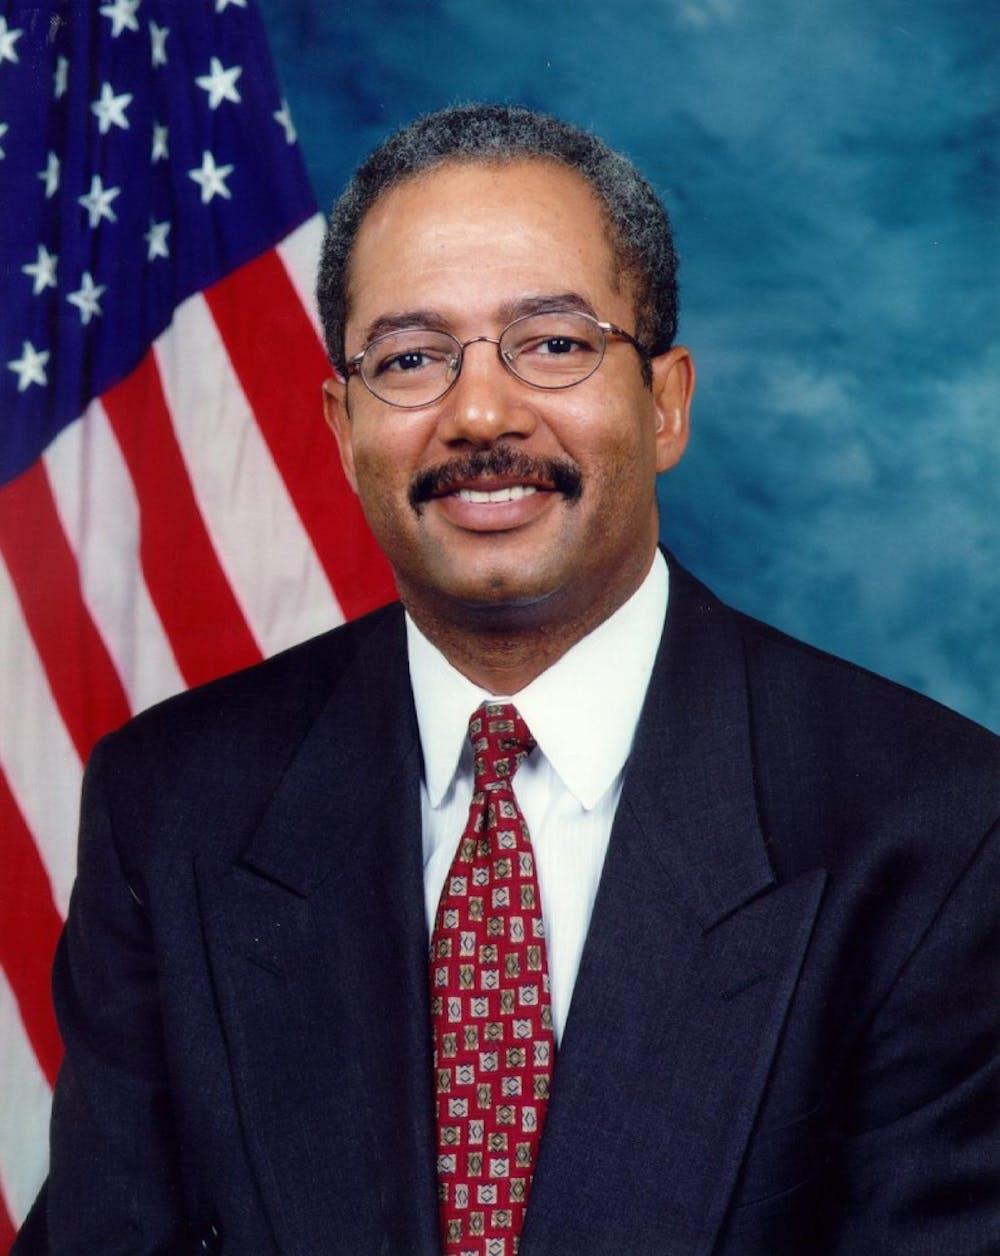 <p>Rep.Chaka Fattah   Official House of Representatives Photo</p>